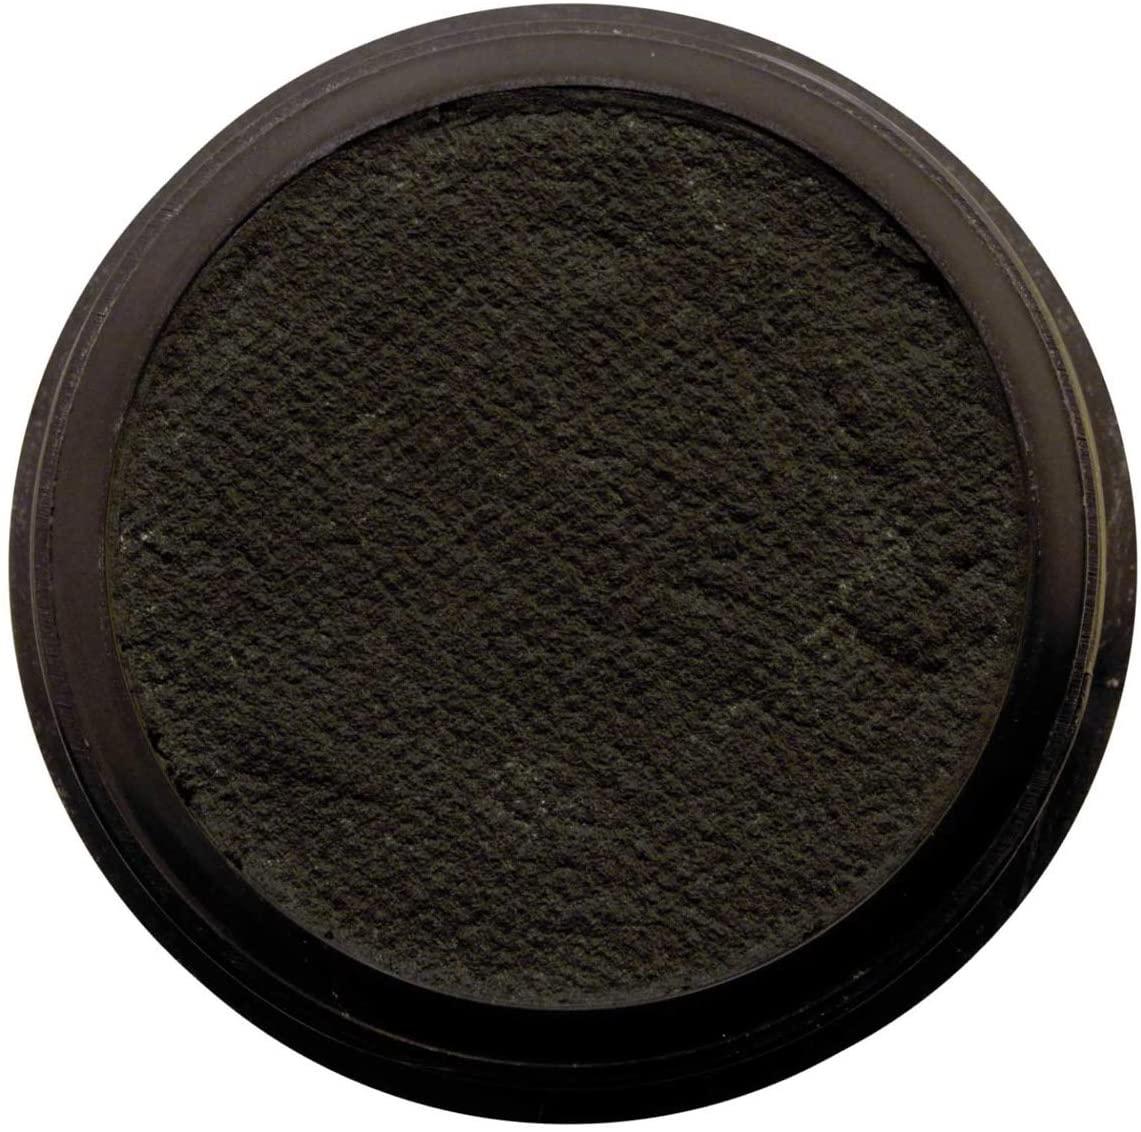 Creative Eulenspiegel 180112 Pearlised Black 20 ml/30 g Professional Aqua Make-Up